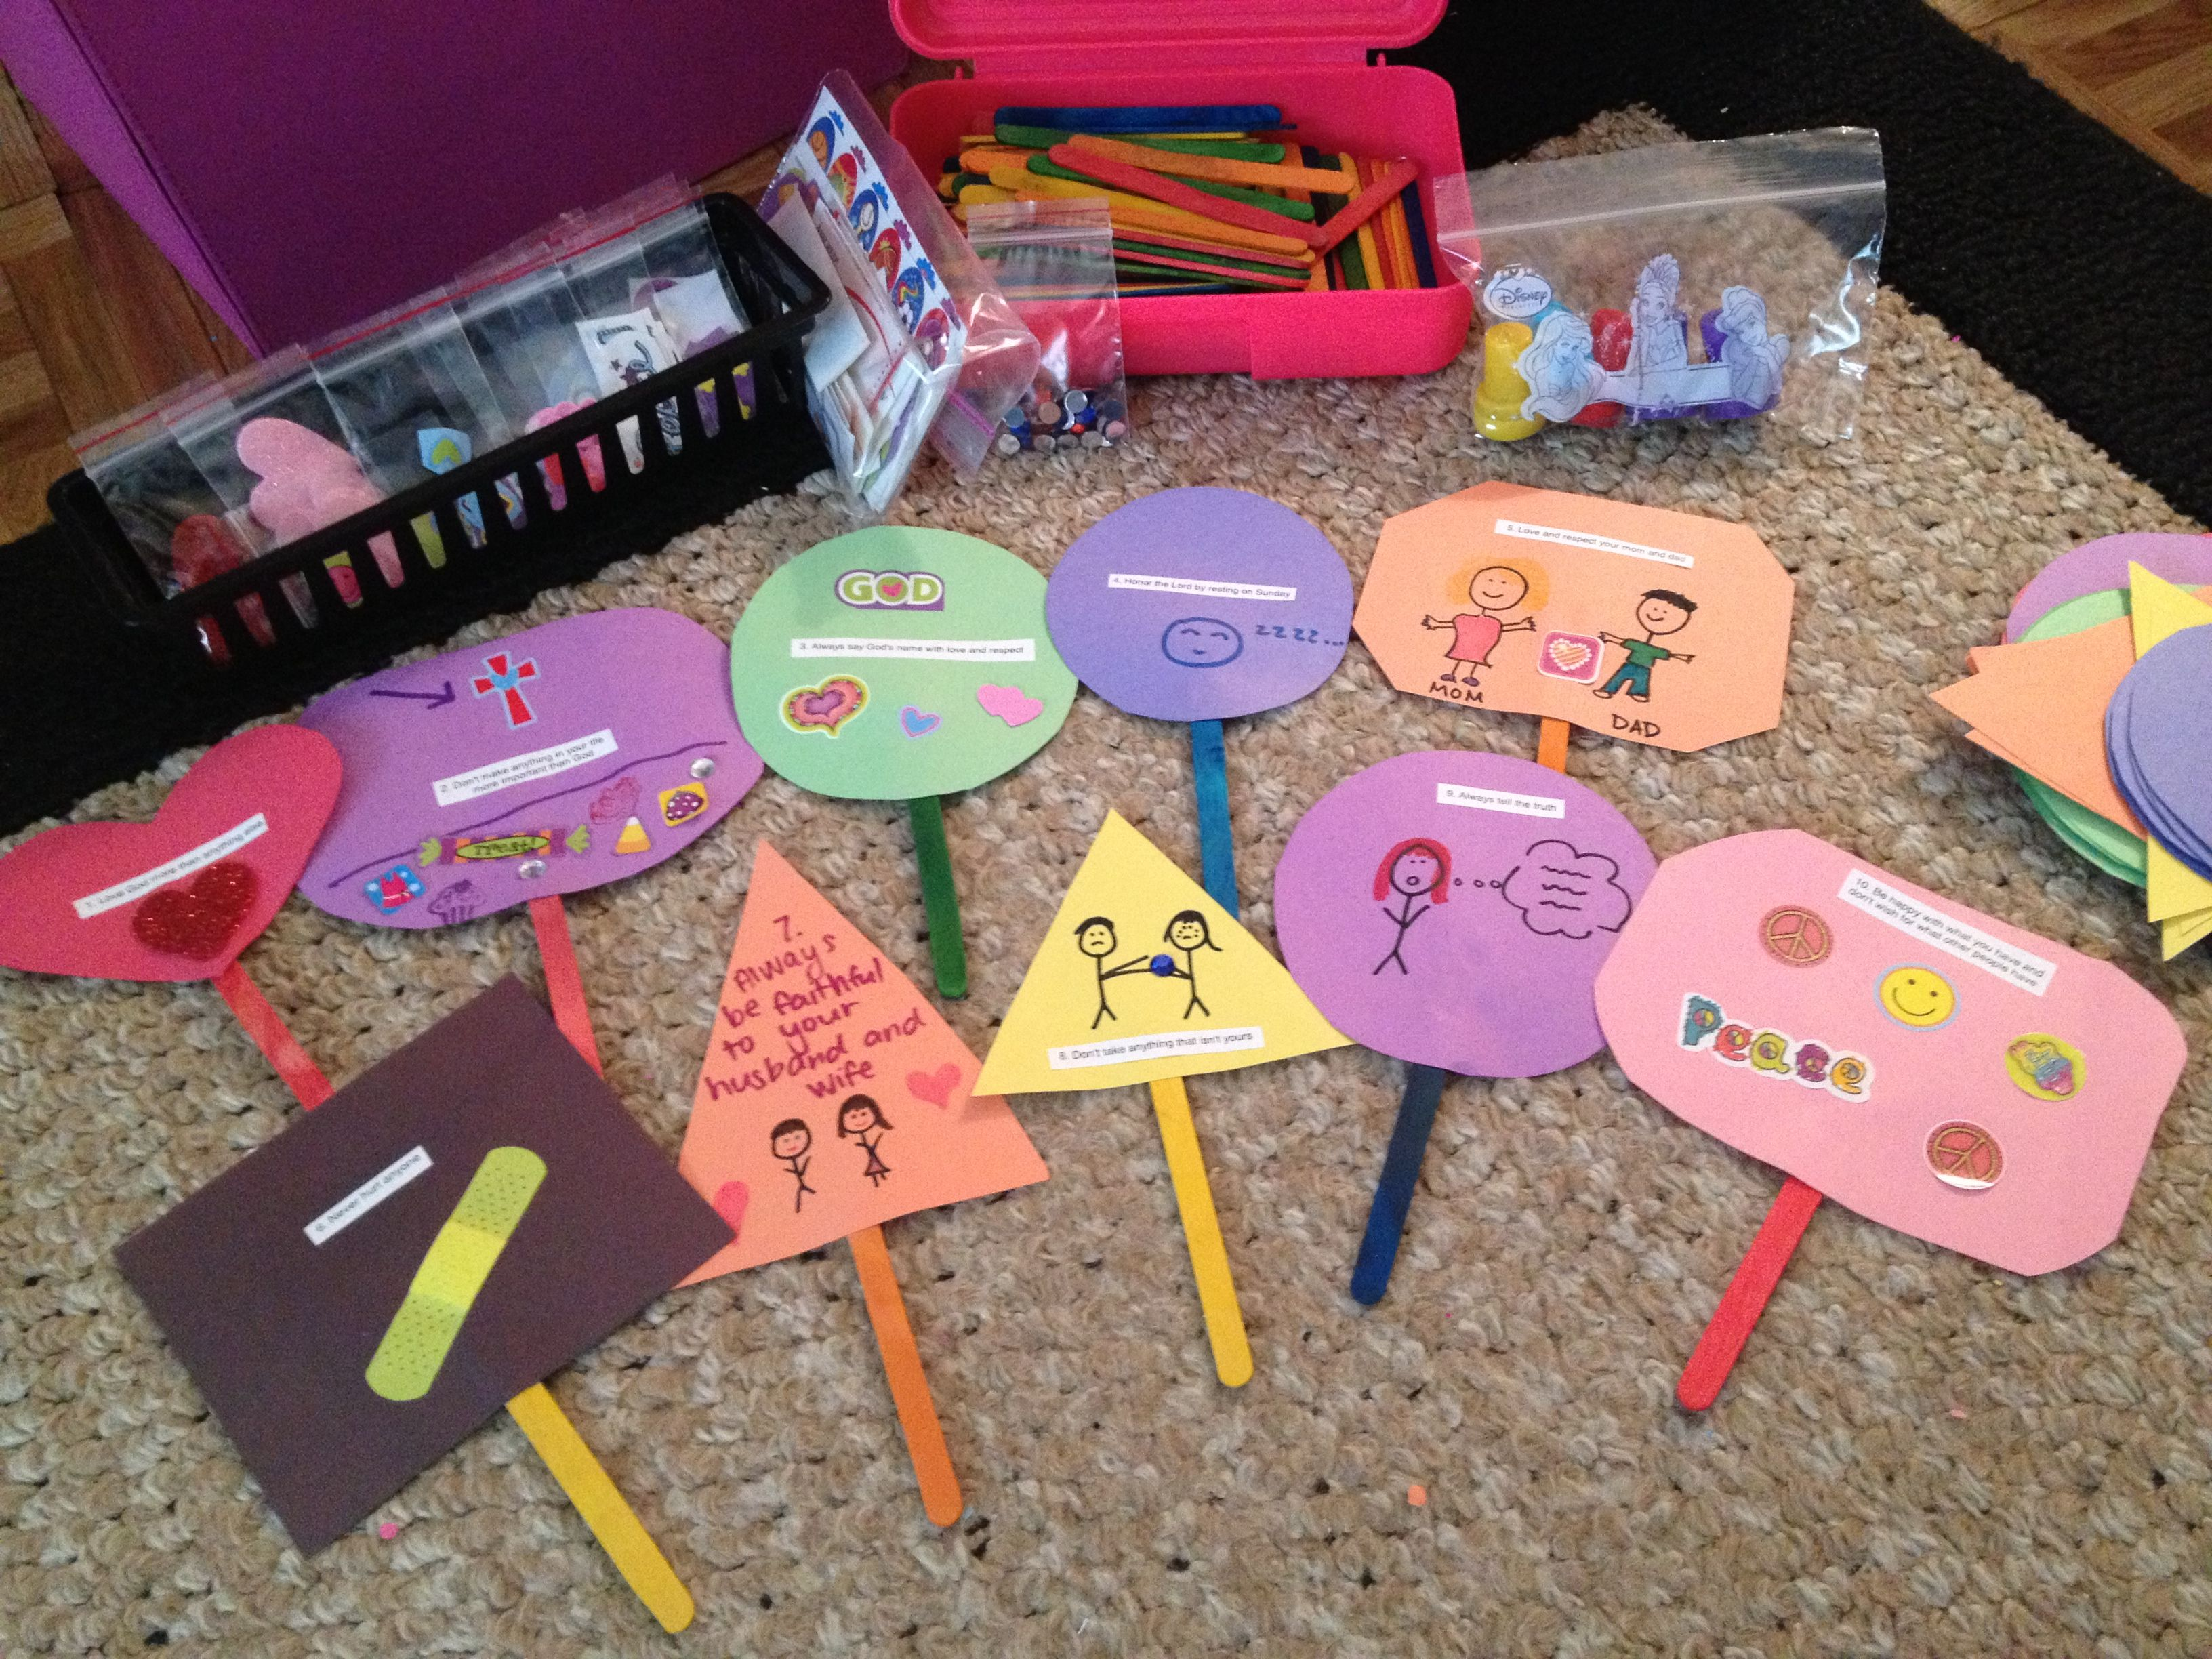 11++ 10 commandments crafts for kindergarten ideas in 2021